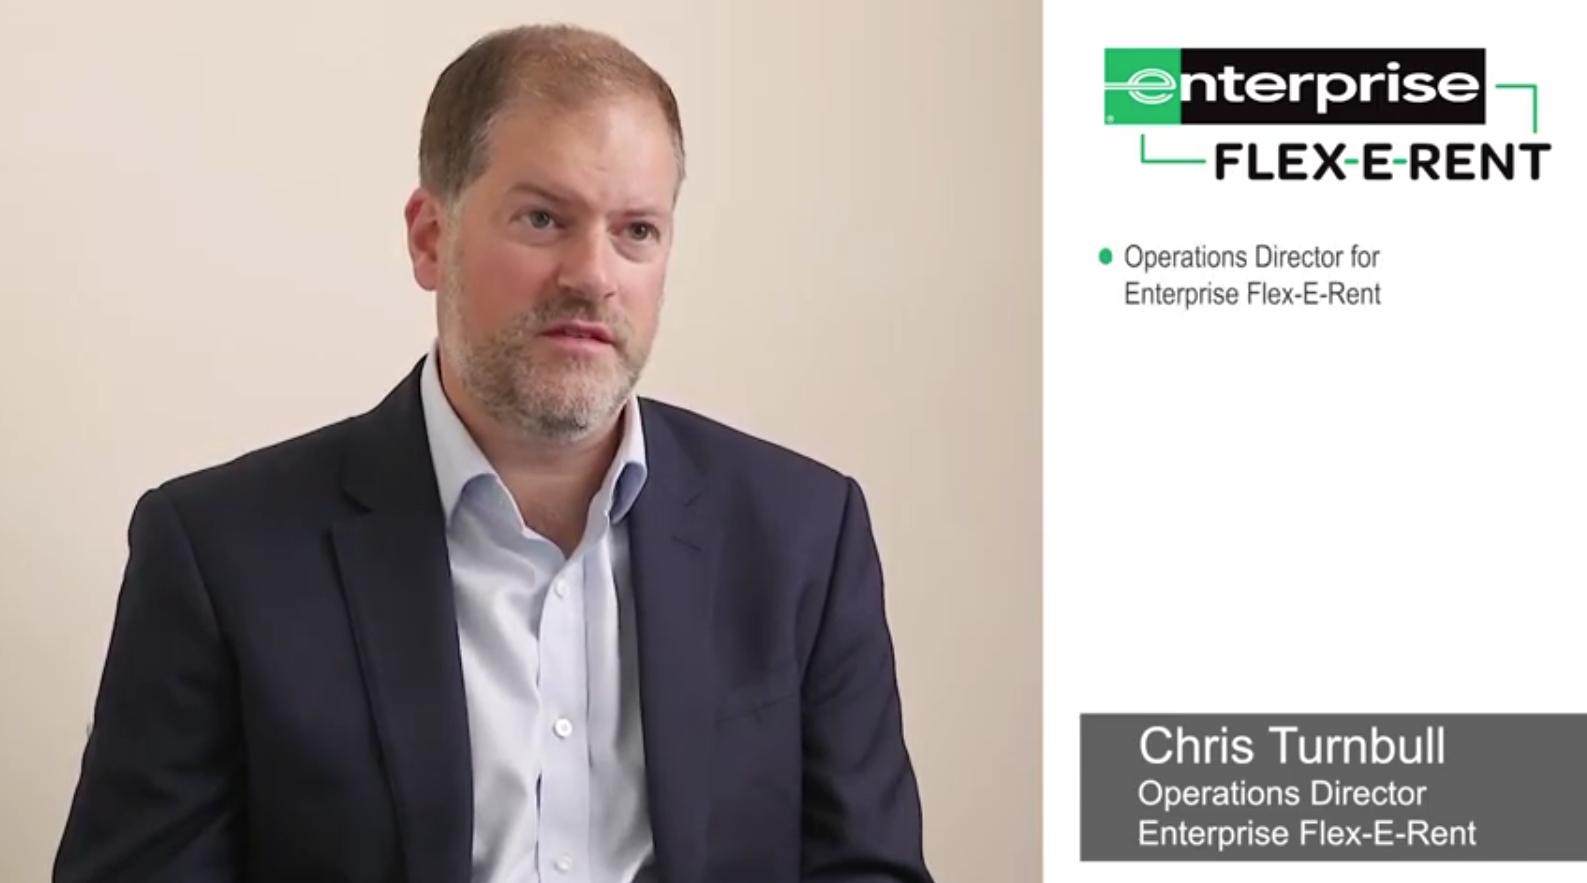 Operations Director - Enterprise Flex-E-Rent, Chris Turnbull - September Feature